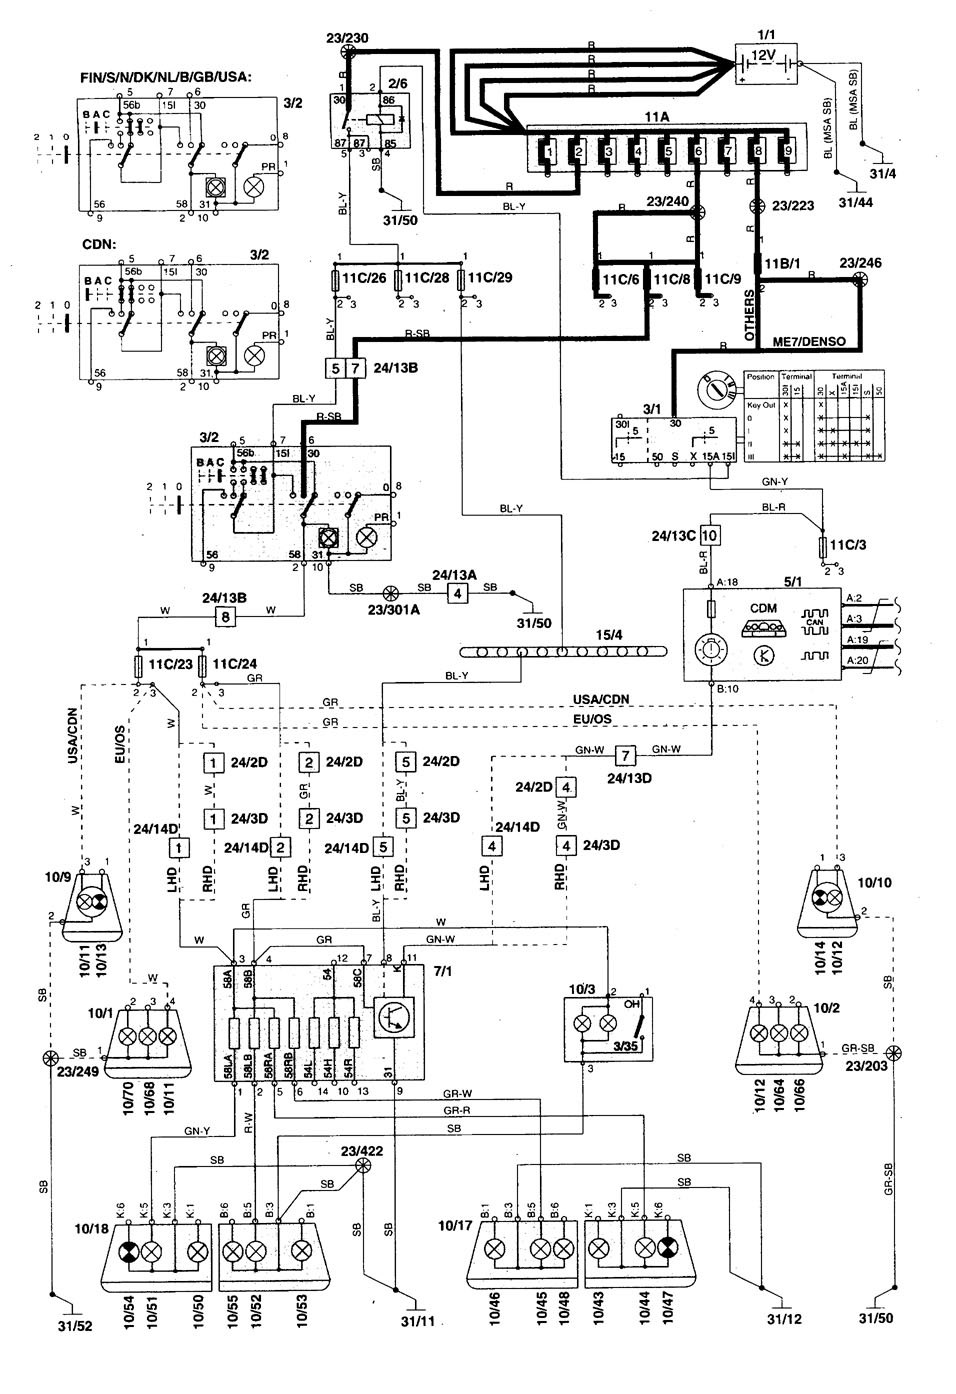 medium resolution of volvo wx64 wiring diagram wiring diagram can volvo wx64 wiring diagram